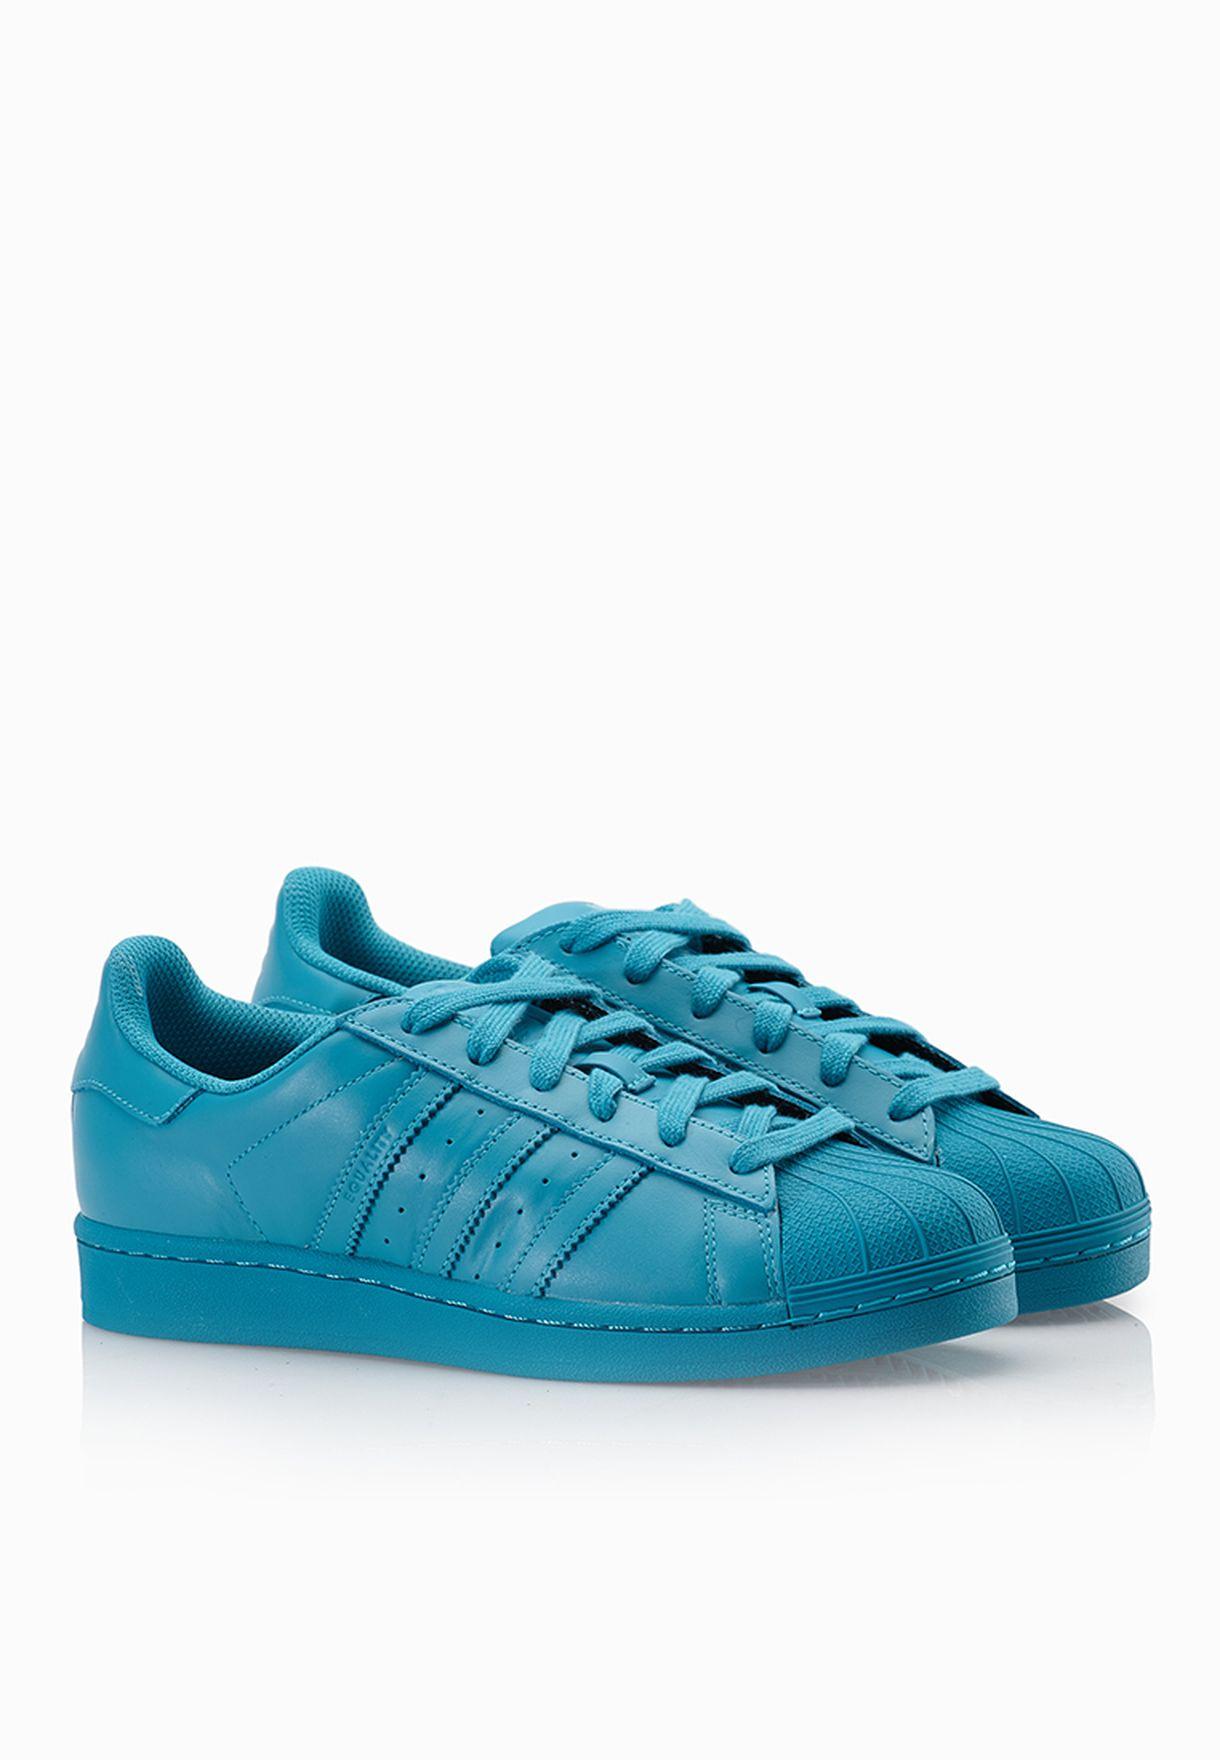 3de521616 Shop adidas Originals blue Pharrell Williams Superstar Sneakers ...